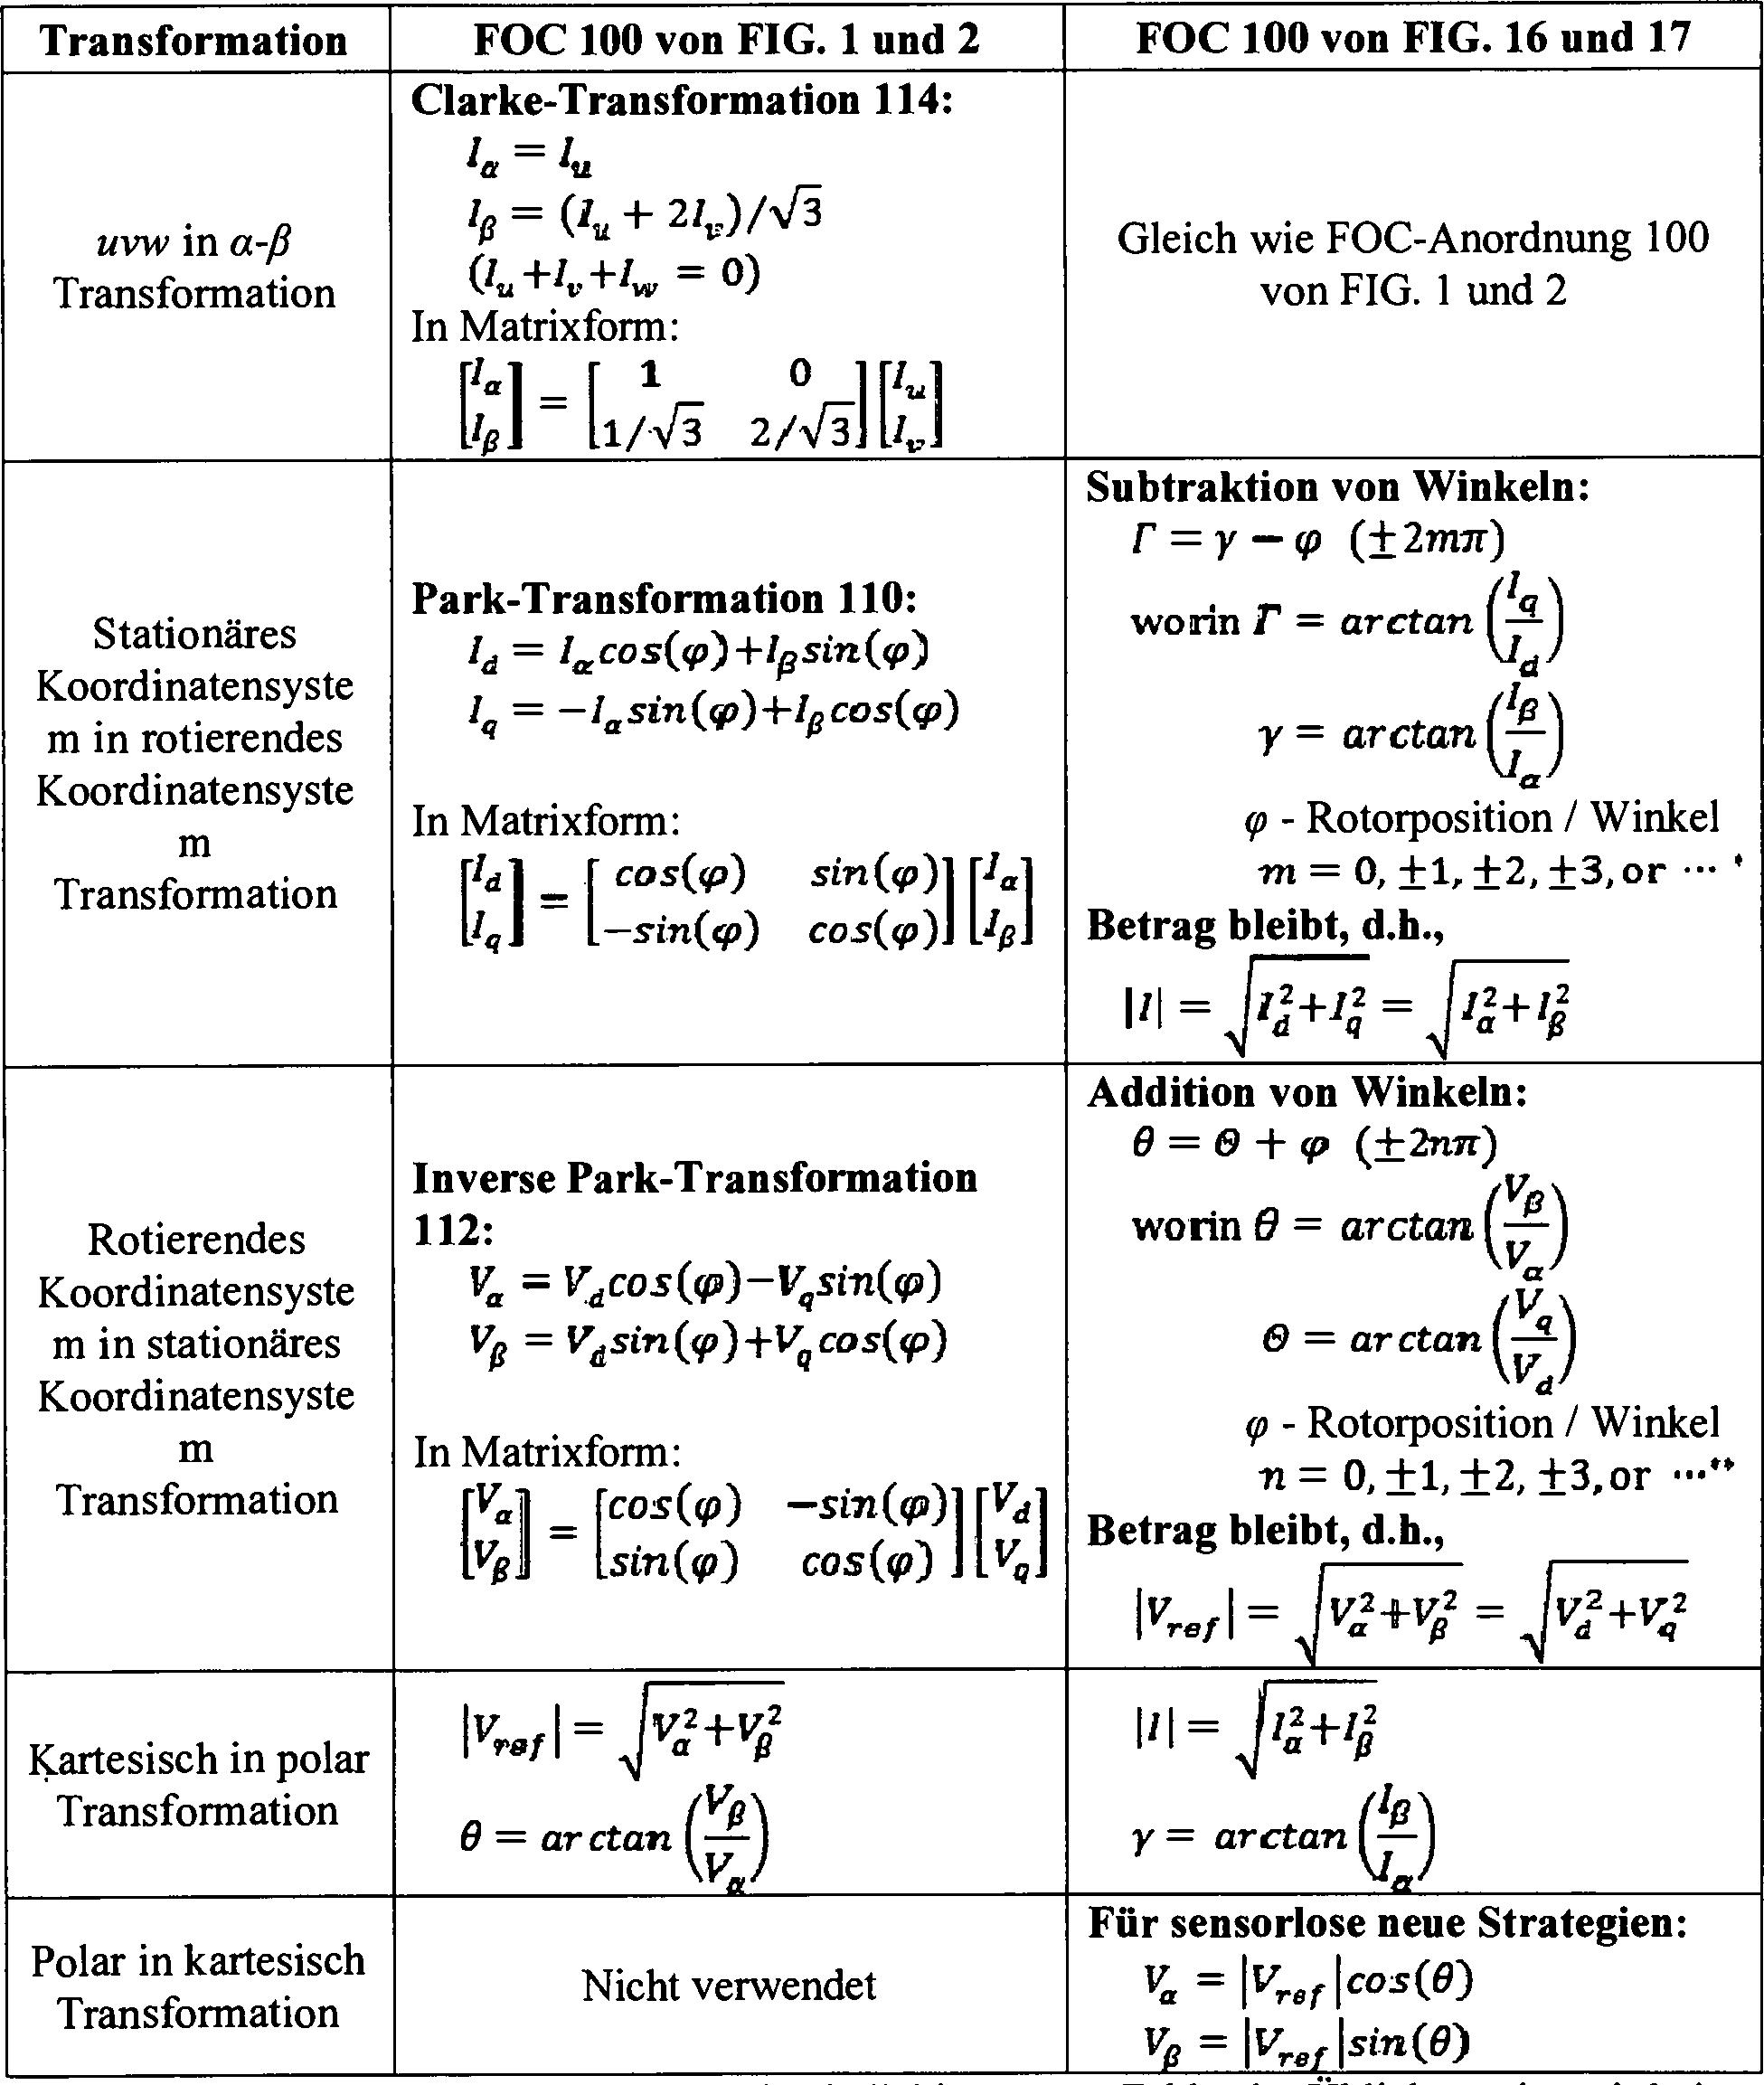 Schön Enorme Tafel Schaltplan Bild Ideen Ideen - Die Besten ...